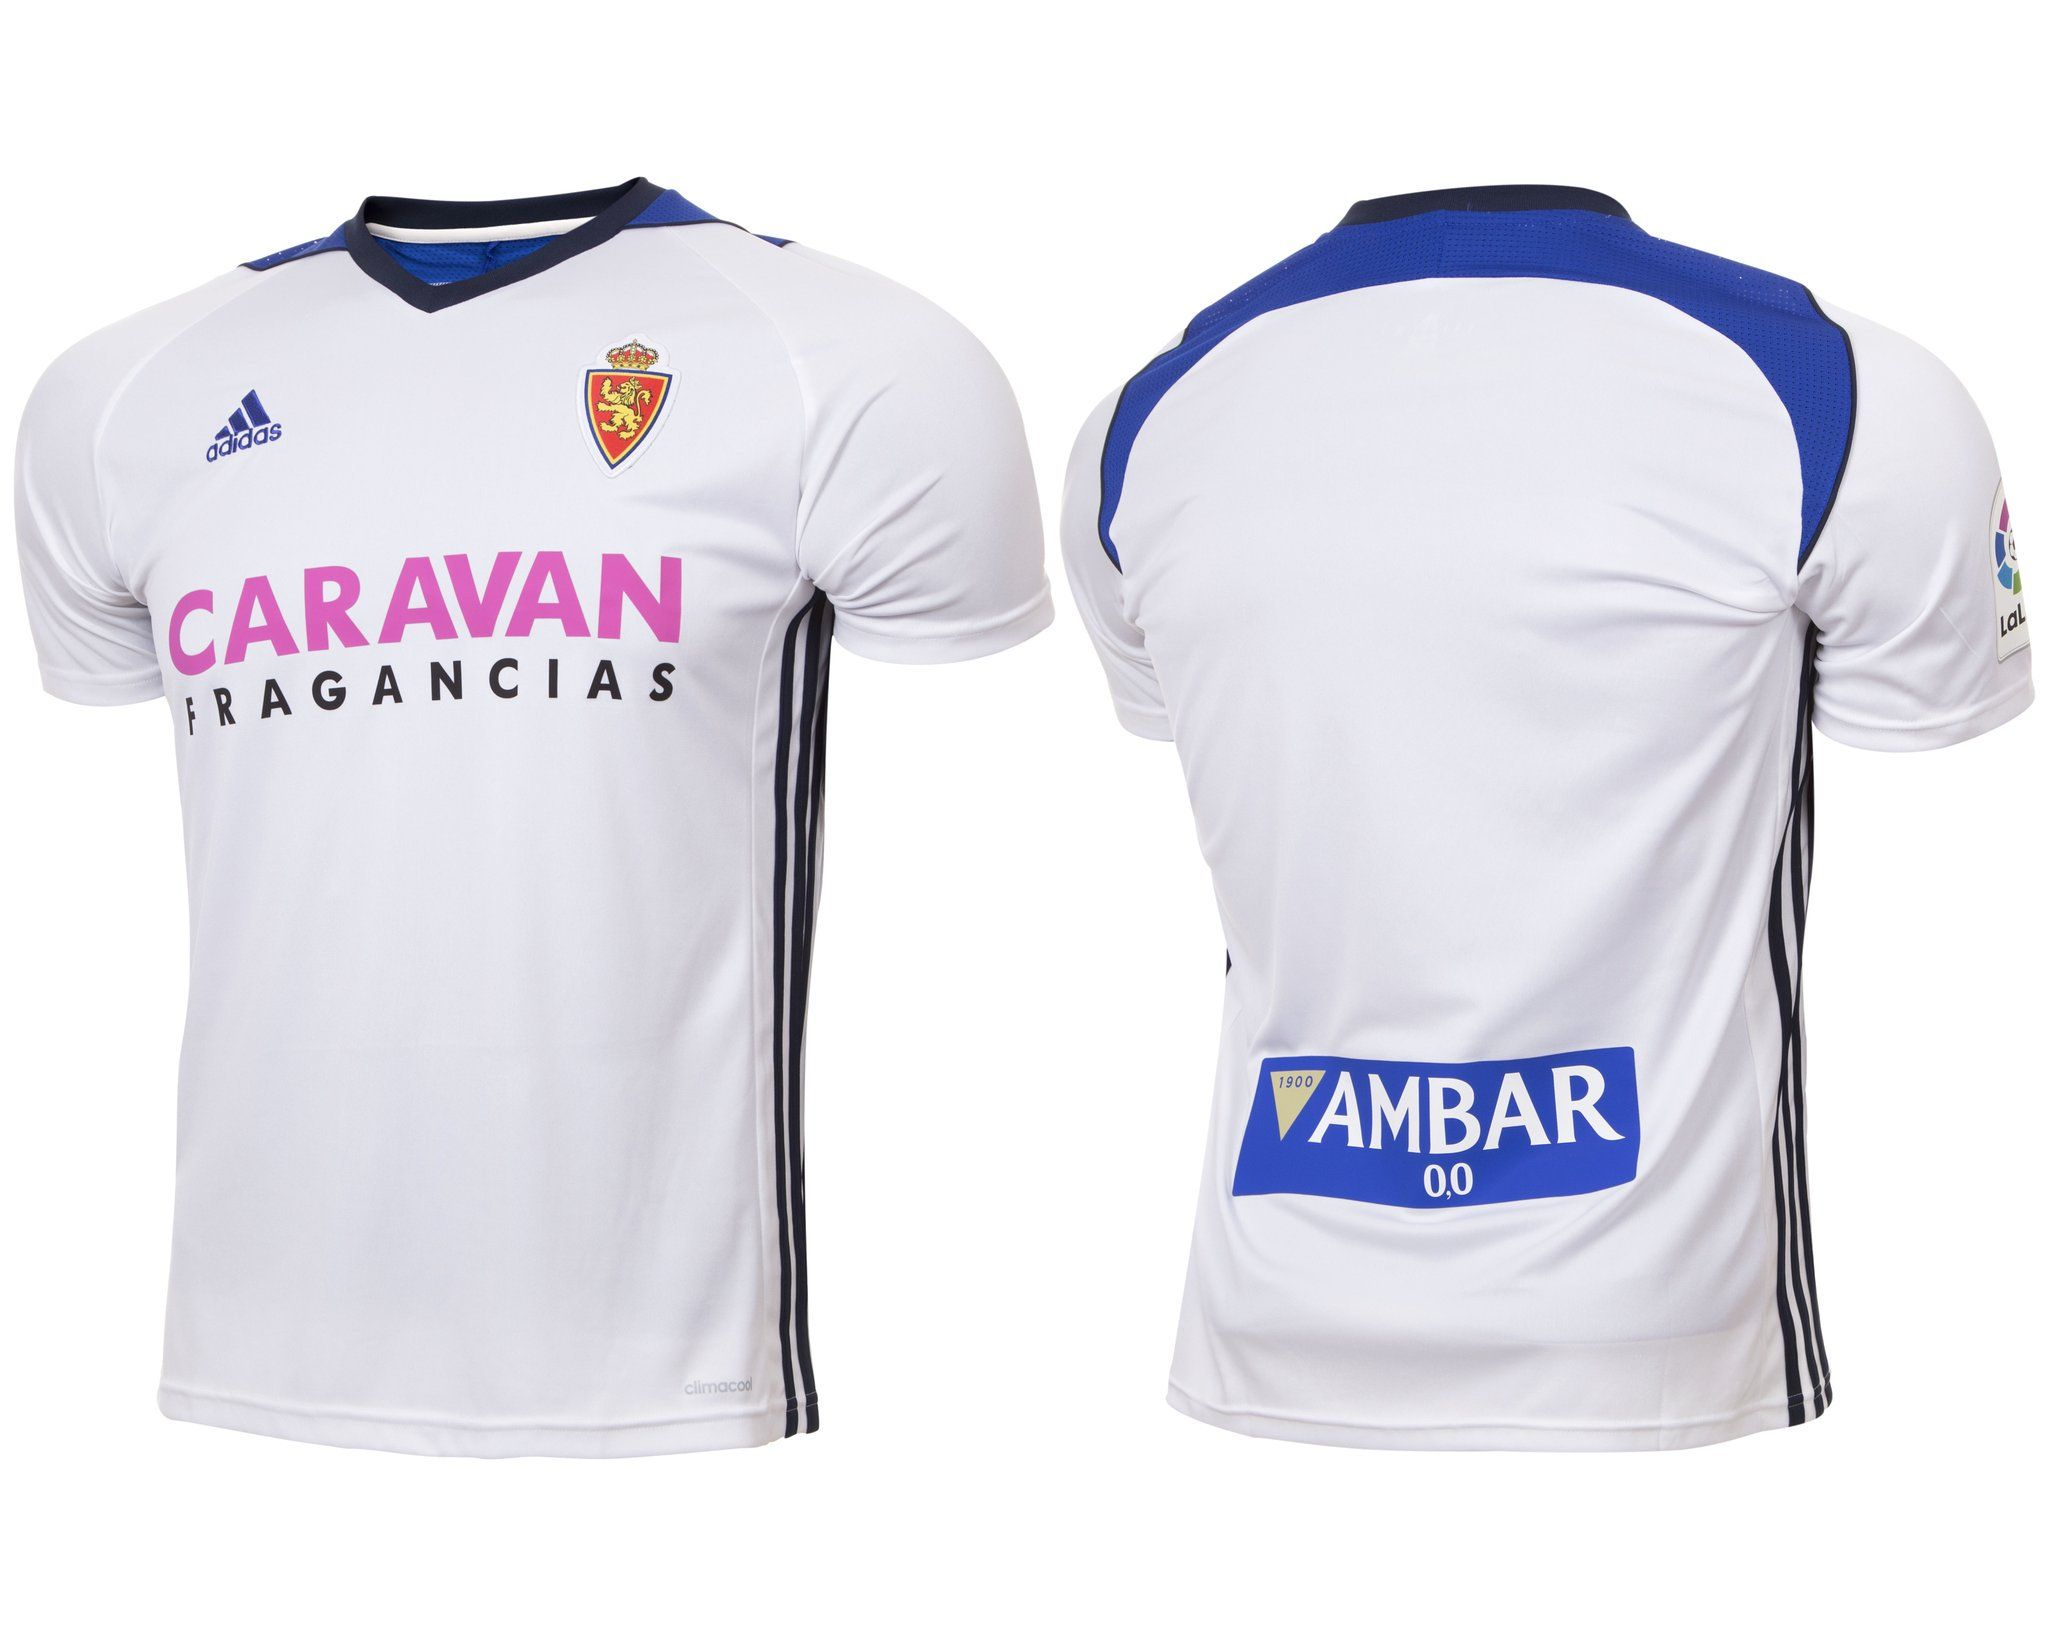 Real Zaragoza (@RealZaragoza) - Twitter - Camisetas, Camisas, Adidas